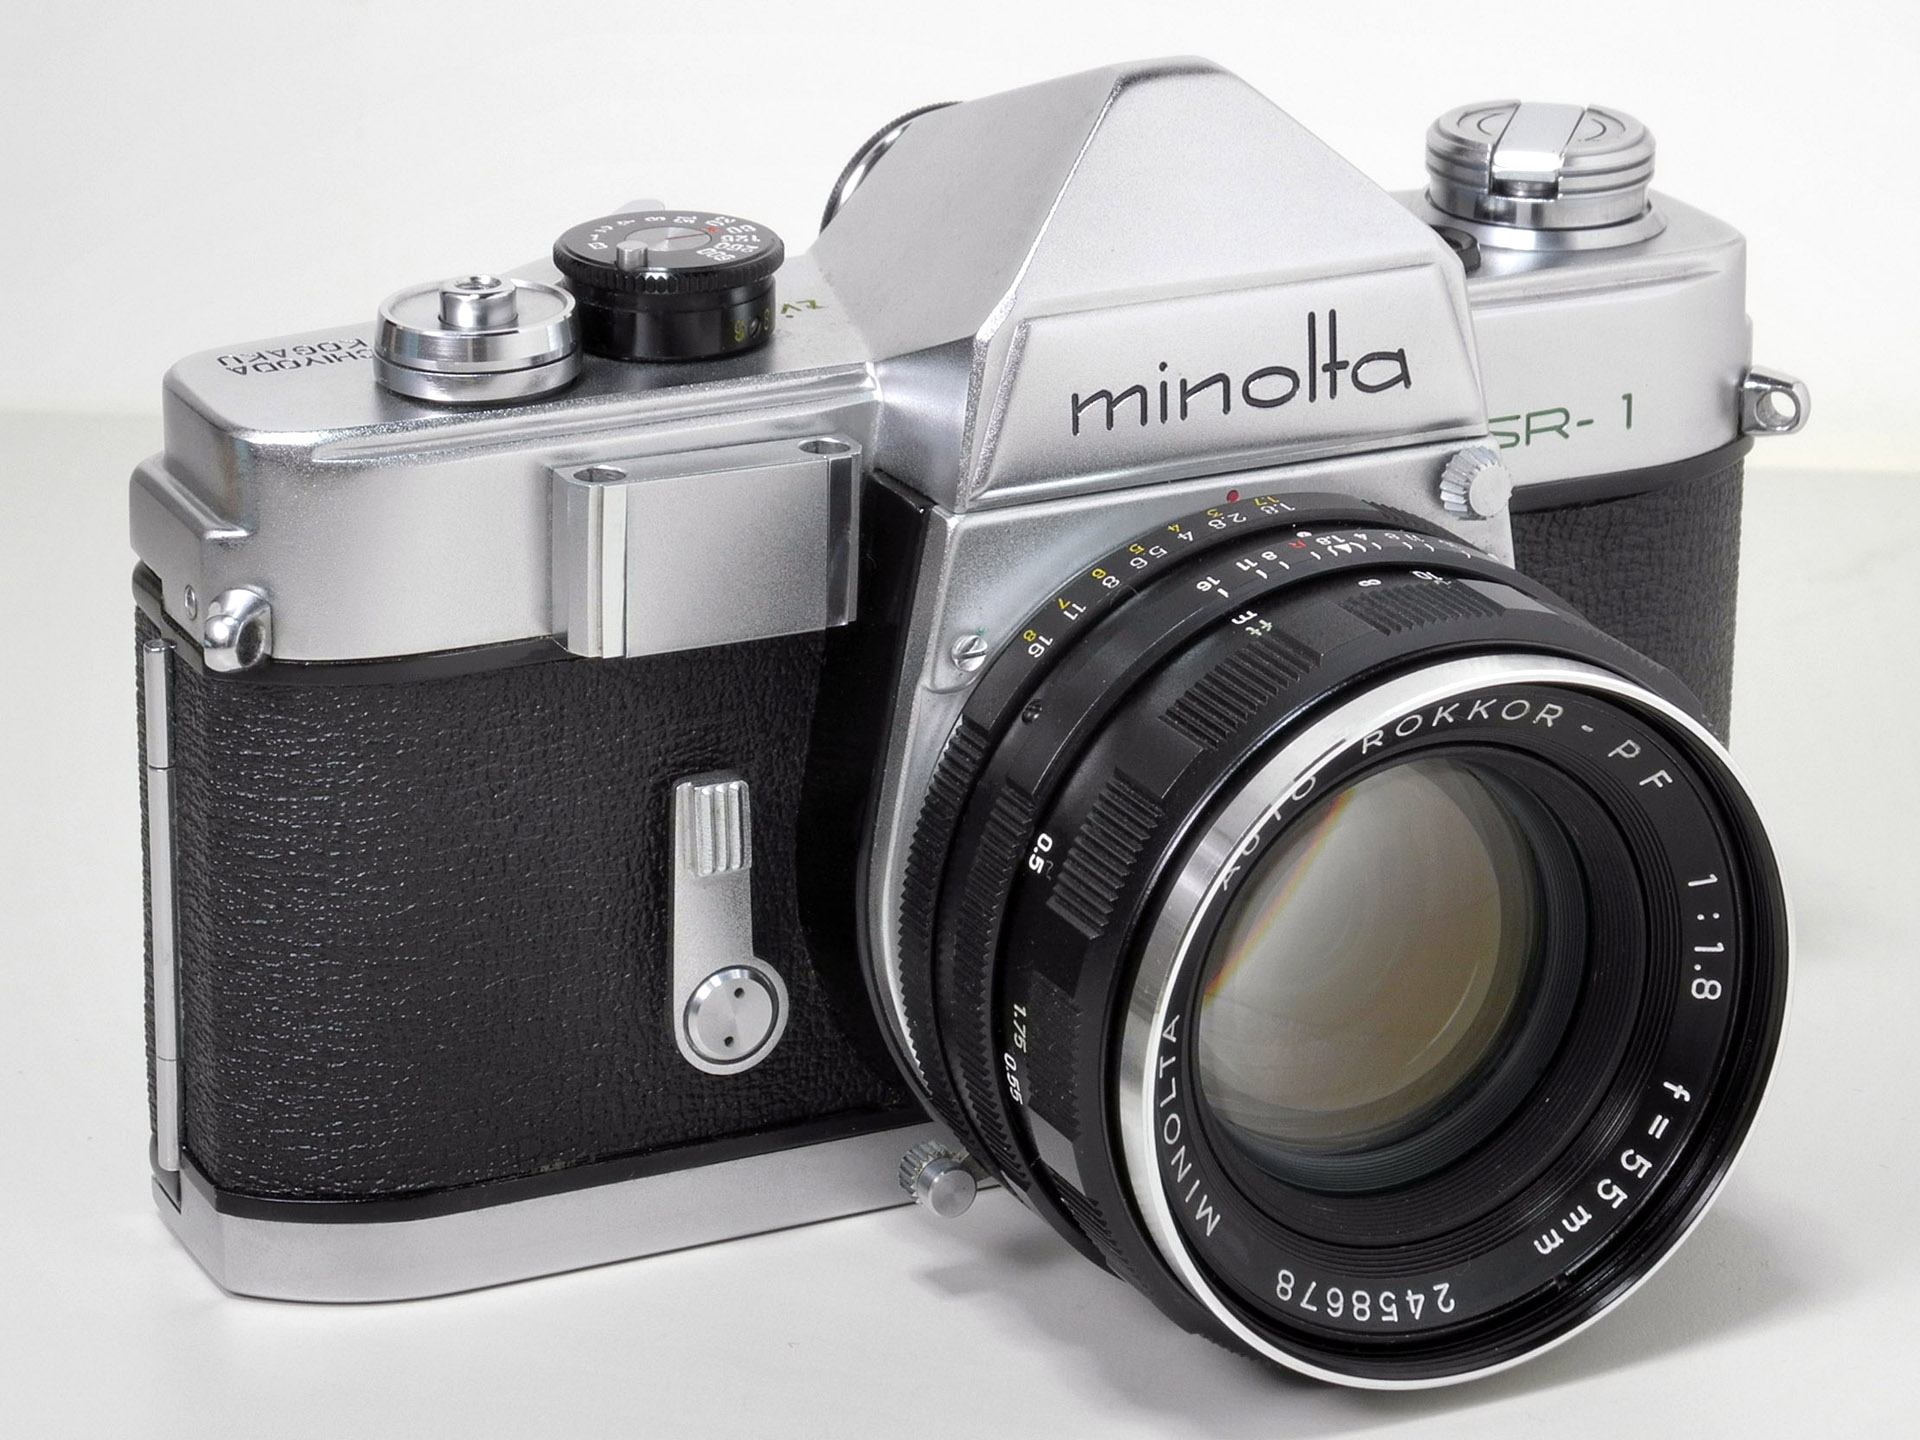 Minolta SR1 - Sem sapata de flash - hotshoe